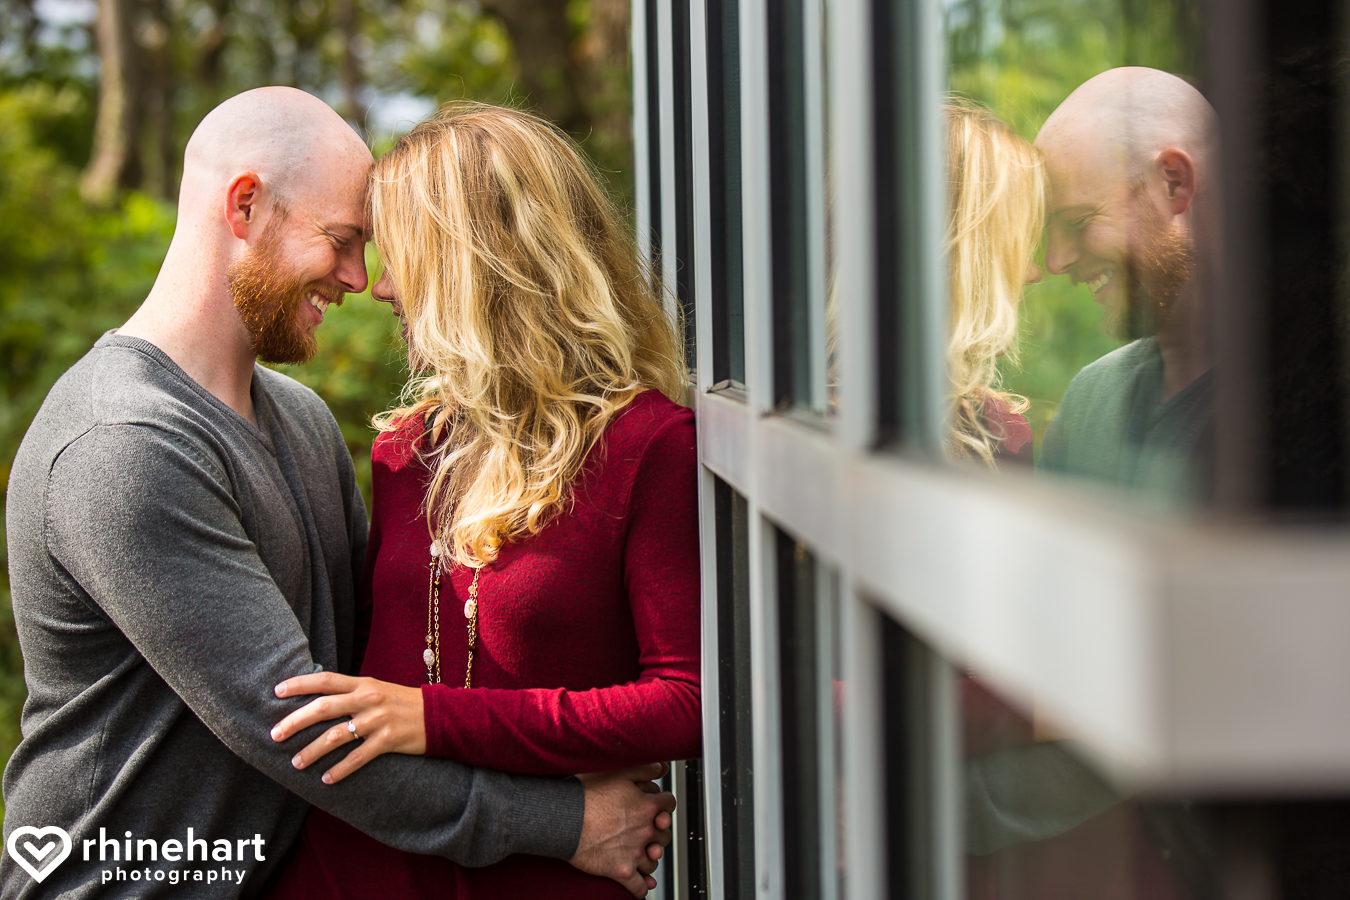 kings-gap-wedding-photographers-greencastle-frederick-carlisle-engagement-best-unique-candid-creative-6